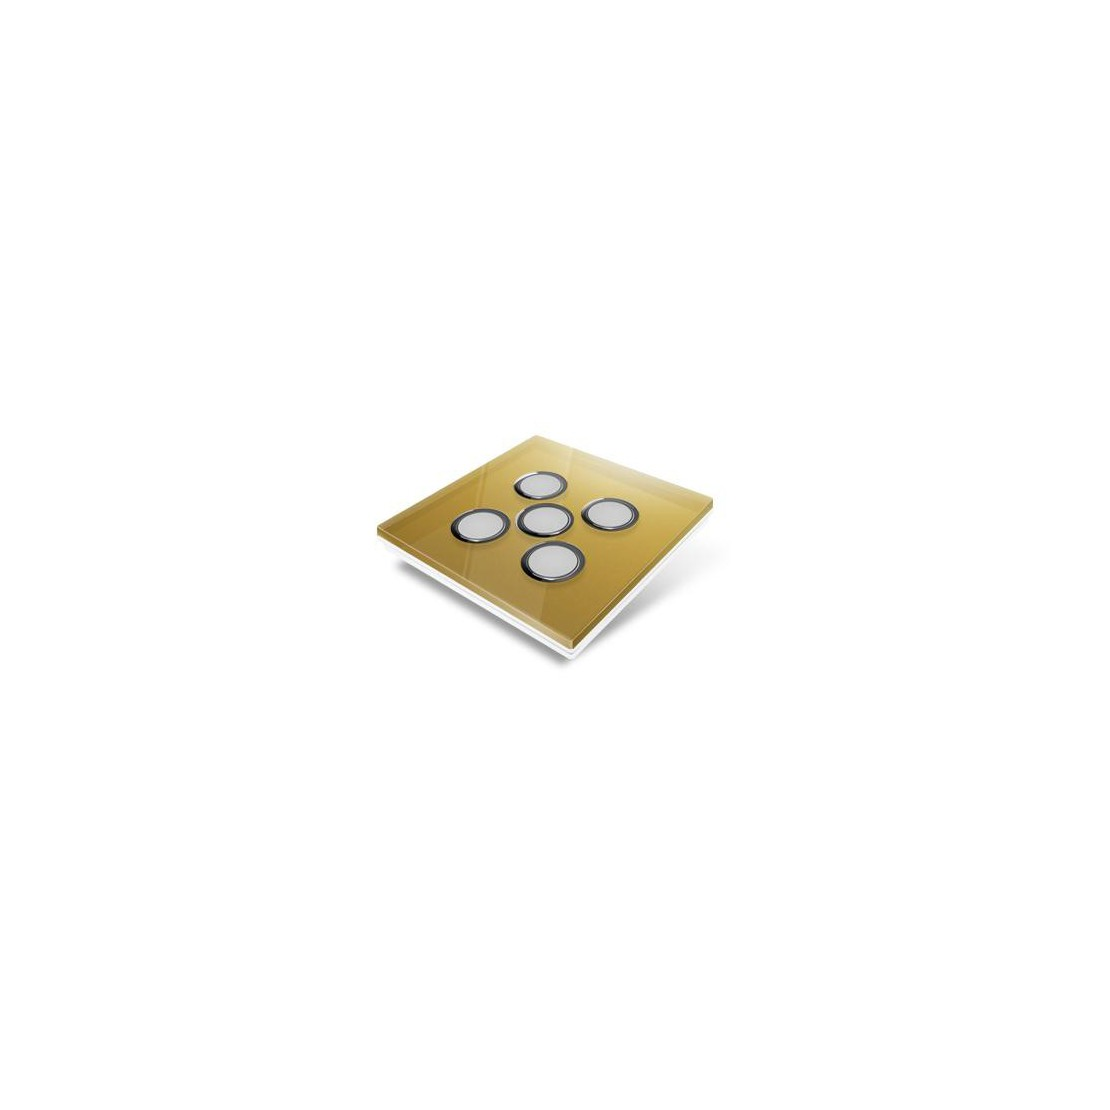 Tampa de cobertura para interruptor Edisio - cristal dourado